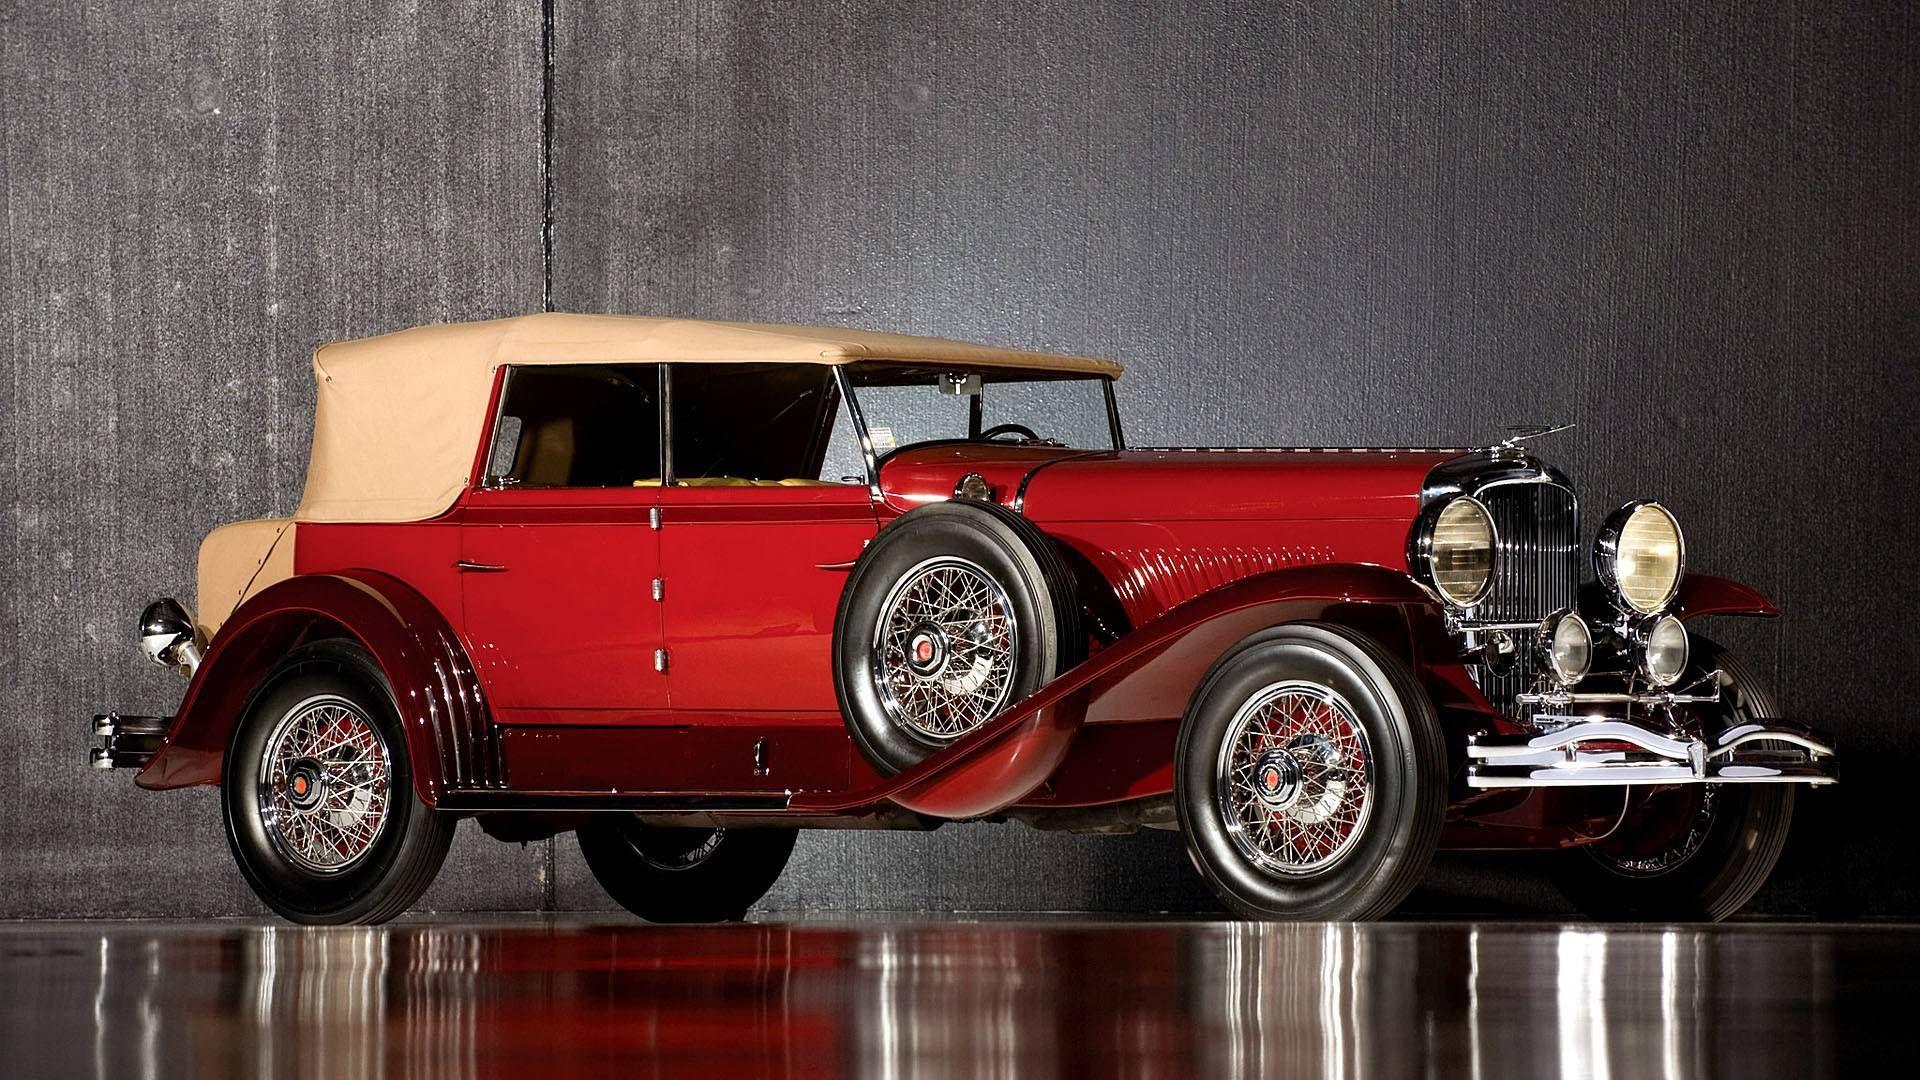 33 TOP Imagens de Carros Antigos | vintage | Pinterest | Car ...